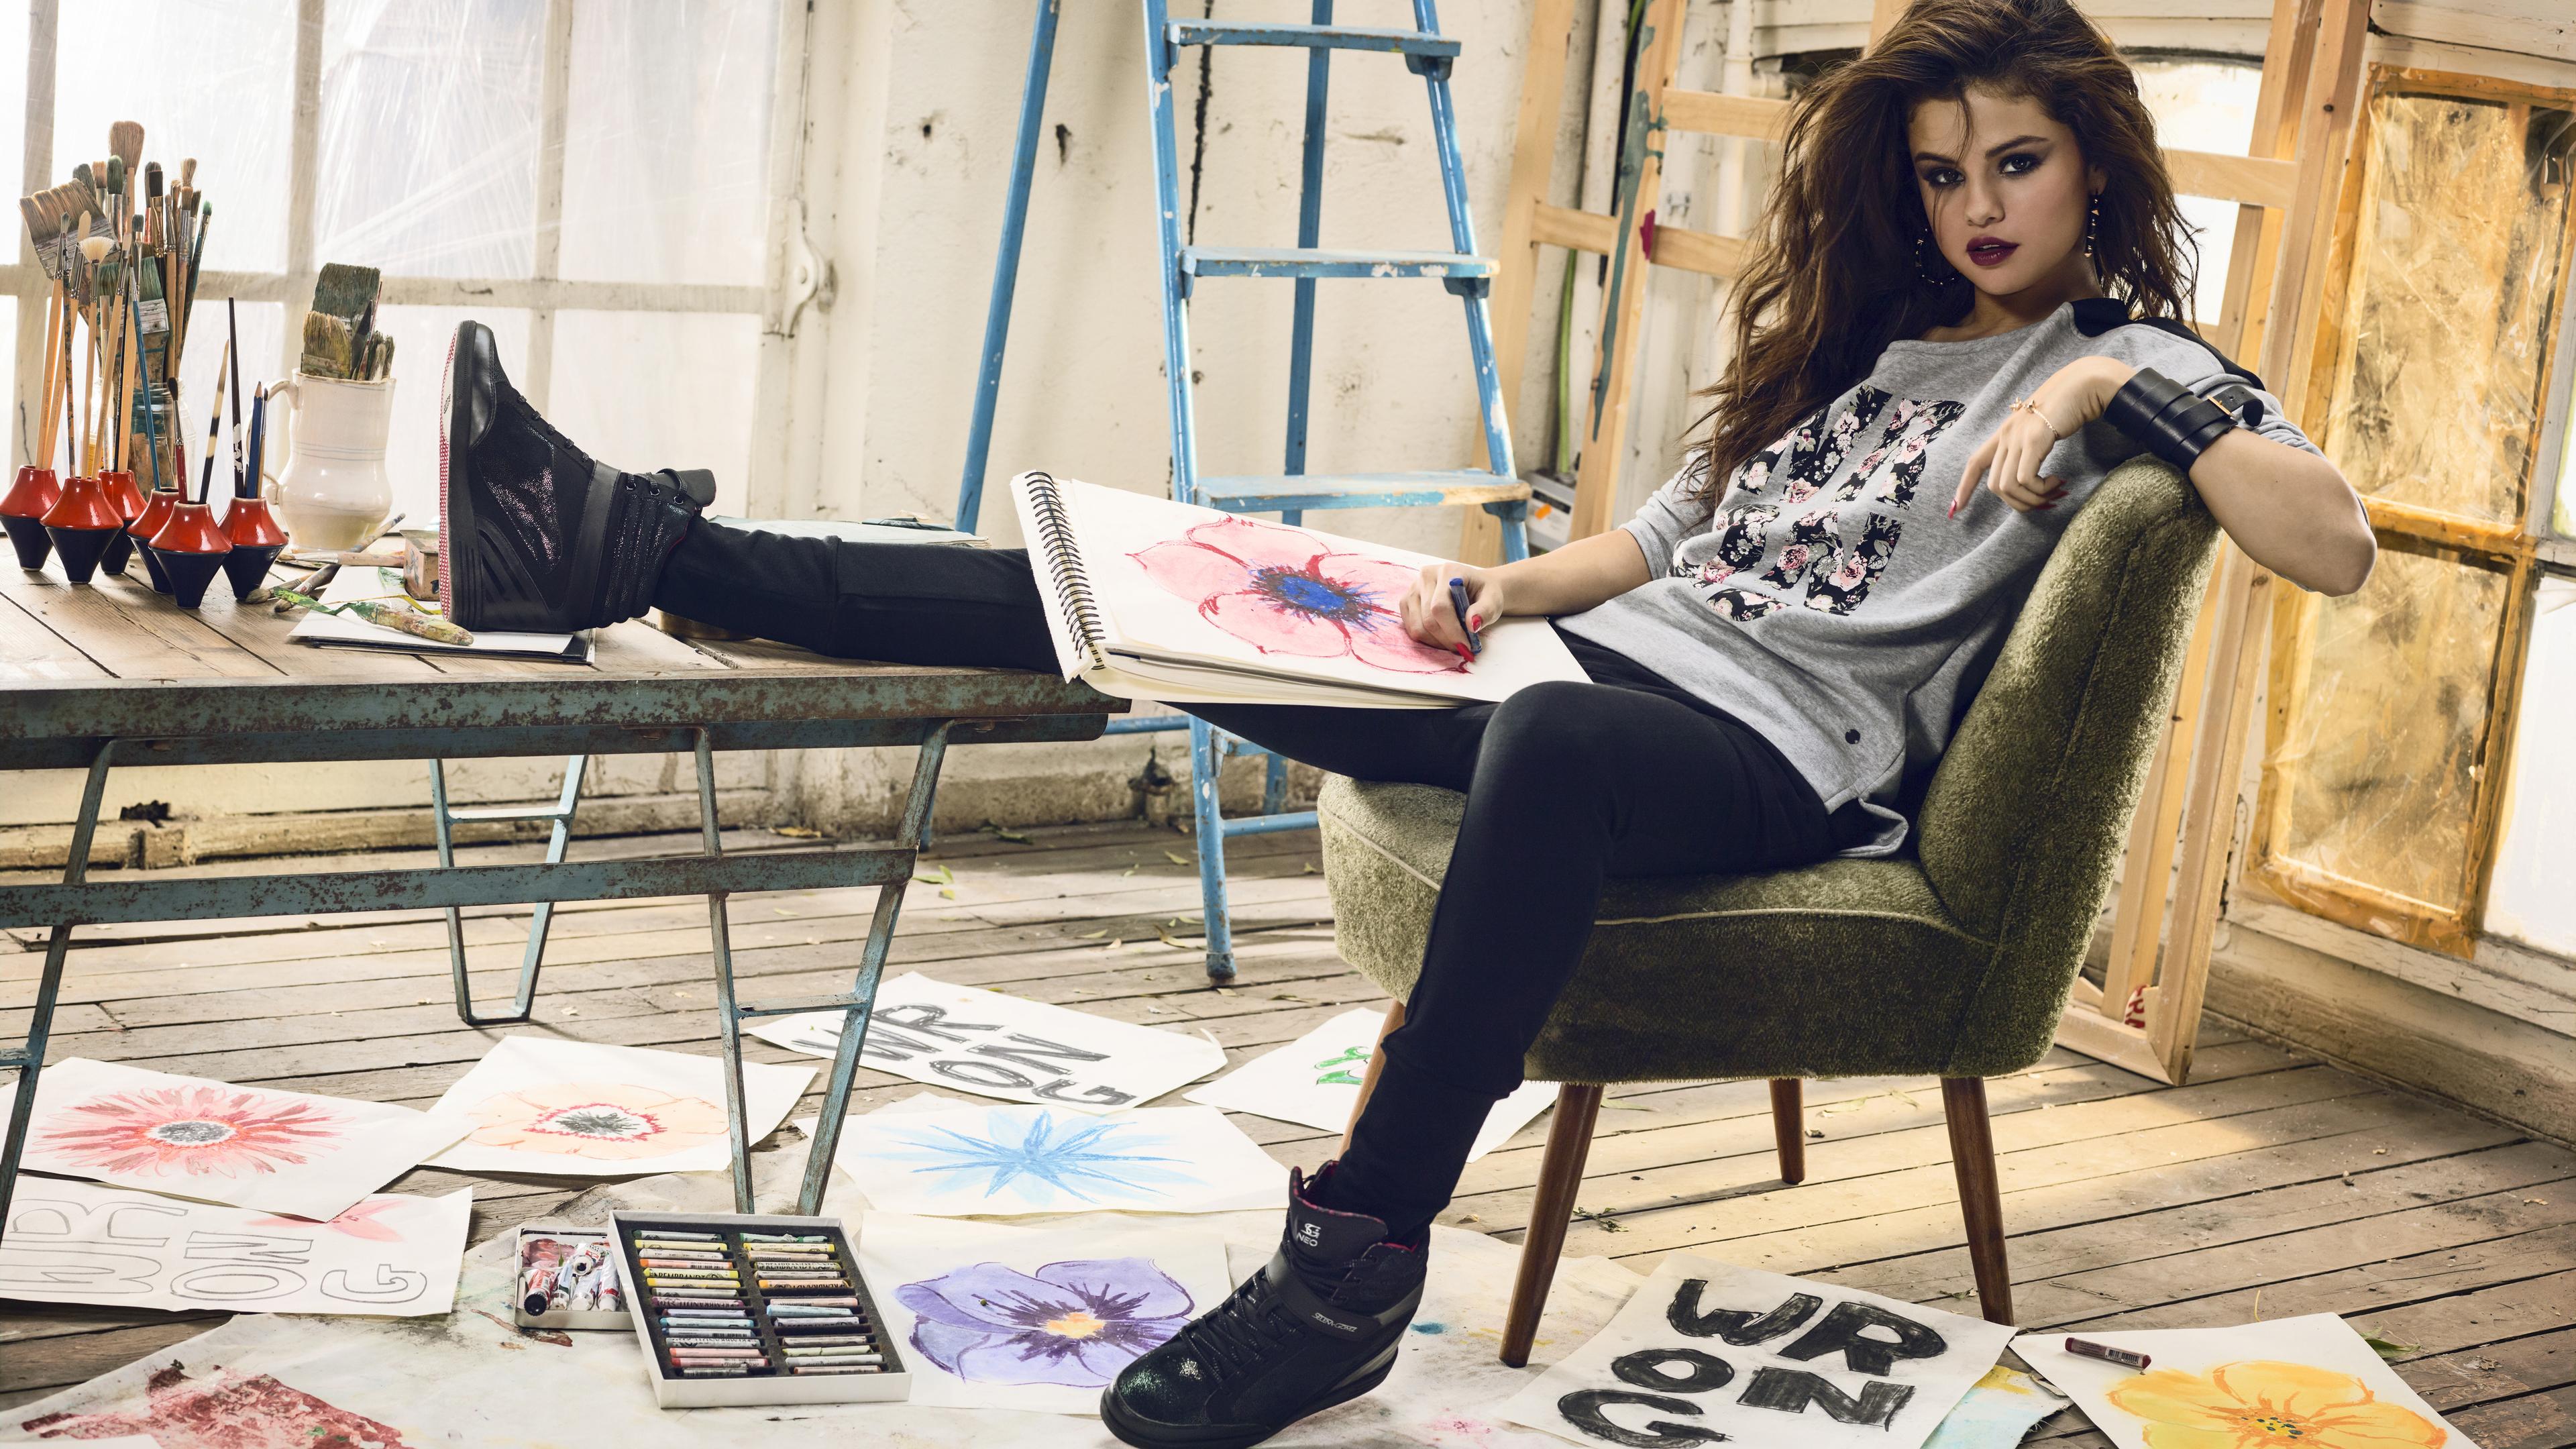 selena gomez adidas 5k neo 1536944711 - Selena Gomez Adidas 5k Neo - selena gomez wallpapers, music wallpapers, hd-wallpapers, girls wallpapers, celebrities wallpapers, adidas wallpapers, 5k wallpapers, 4k-wallpapers